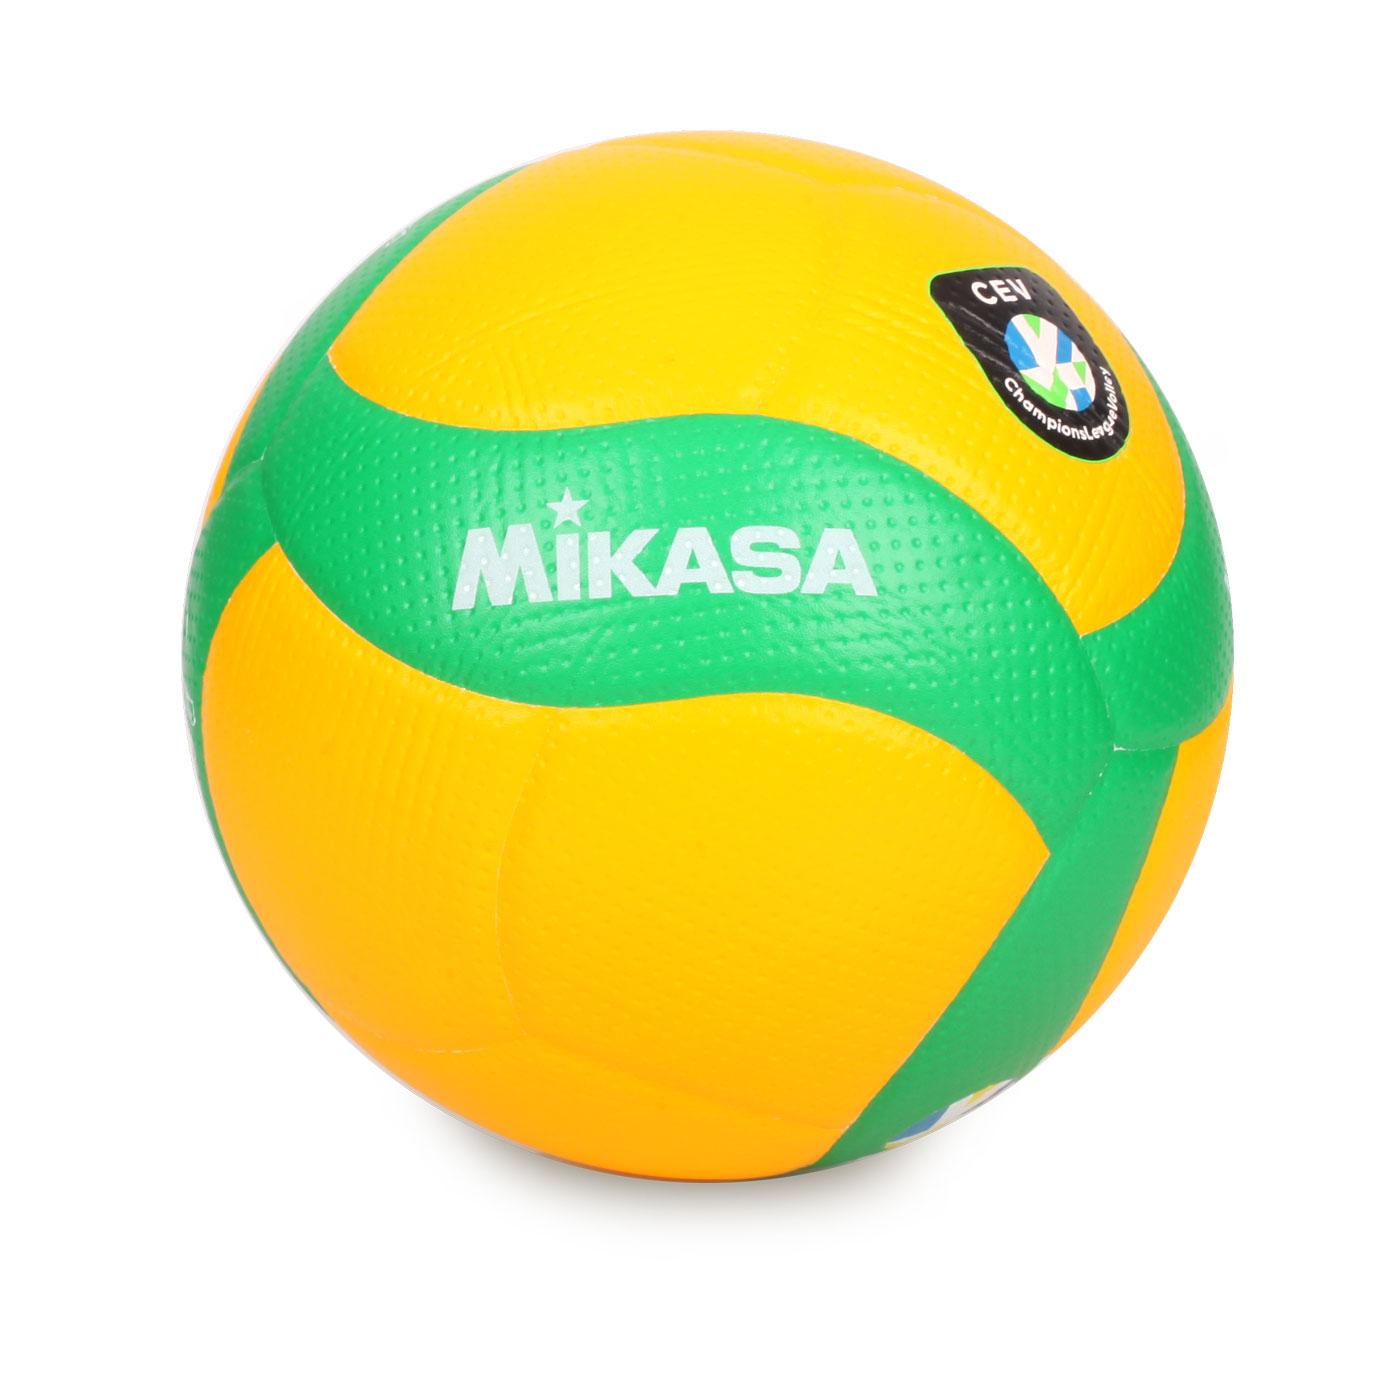 MIKASA 歐冠專用比賽用排球#5 KMV200WCEV - 黃綠